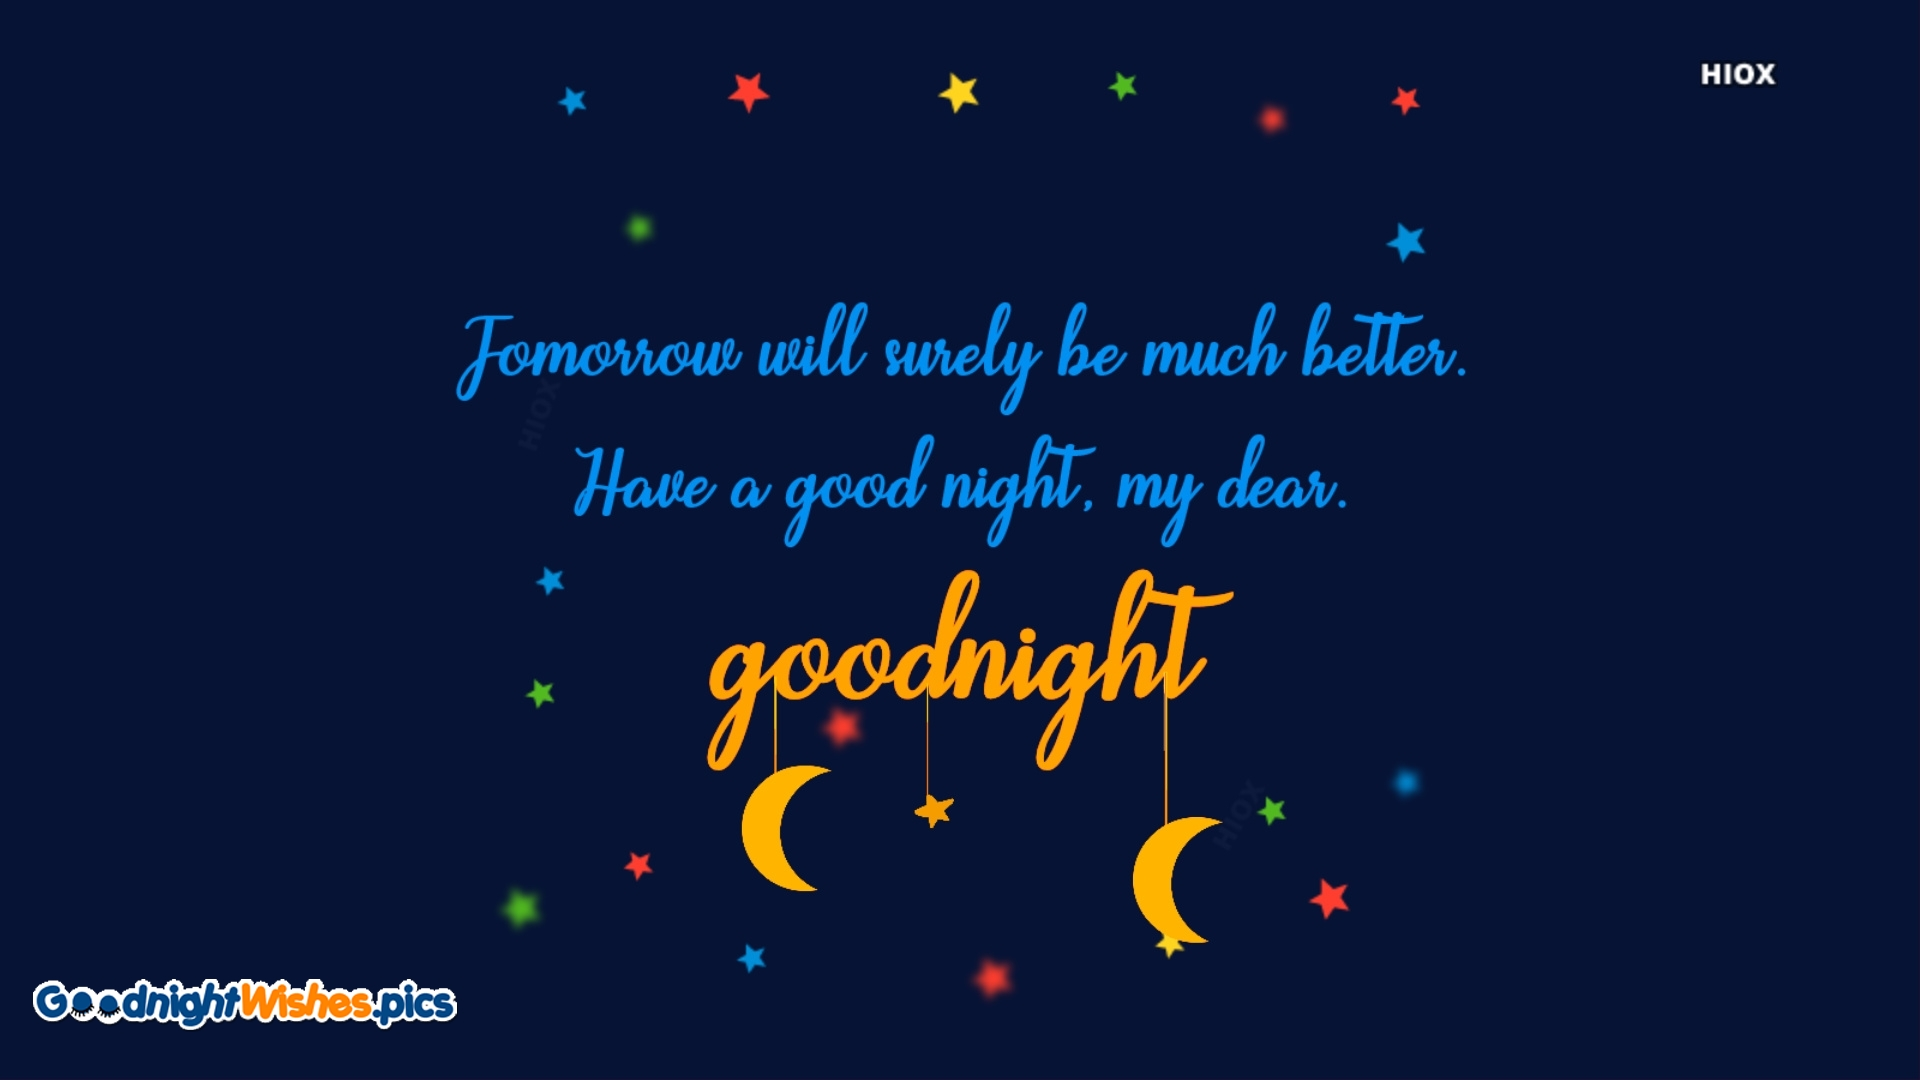 Have A Good Night, My Dear.